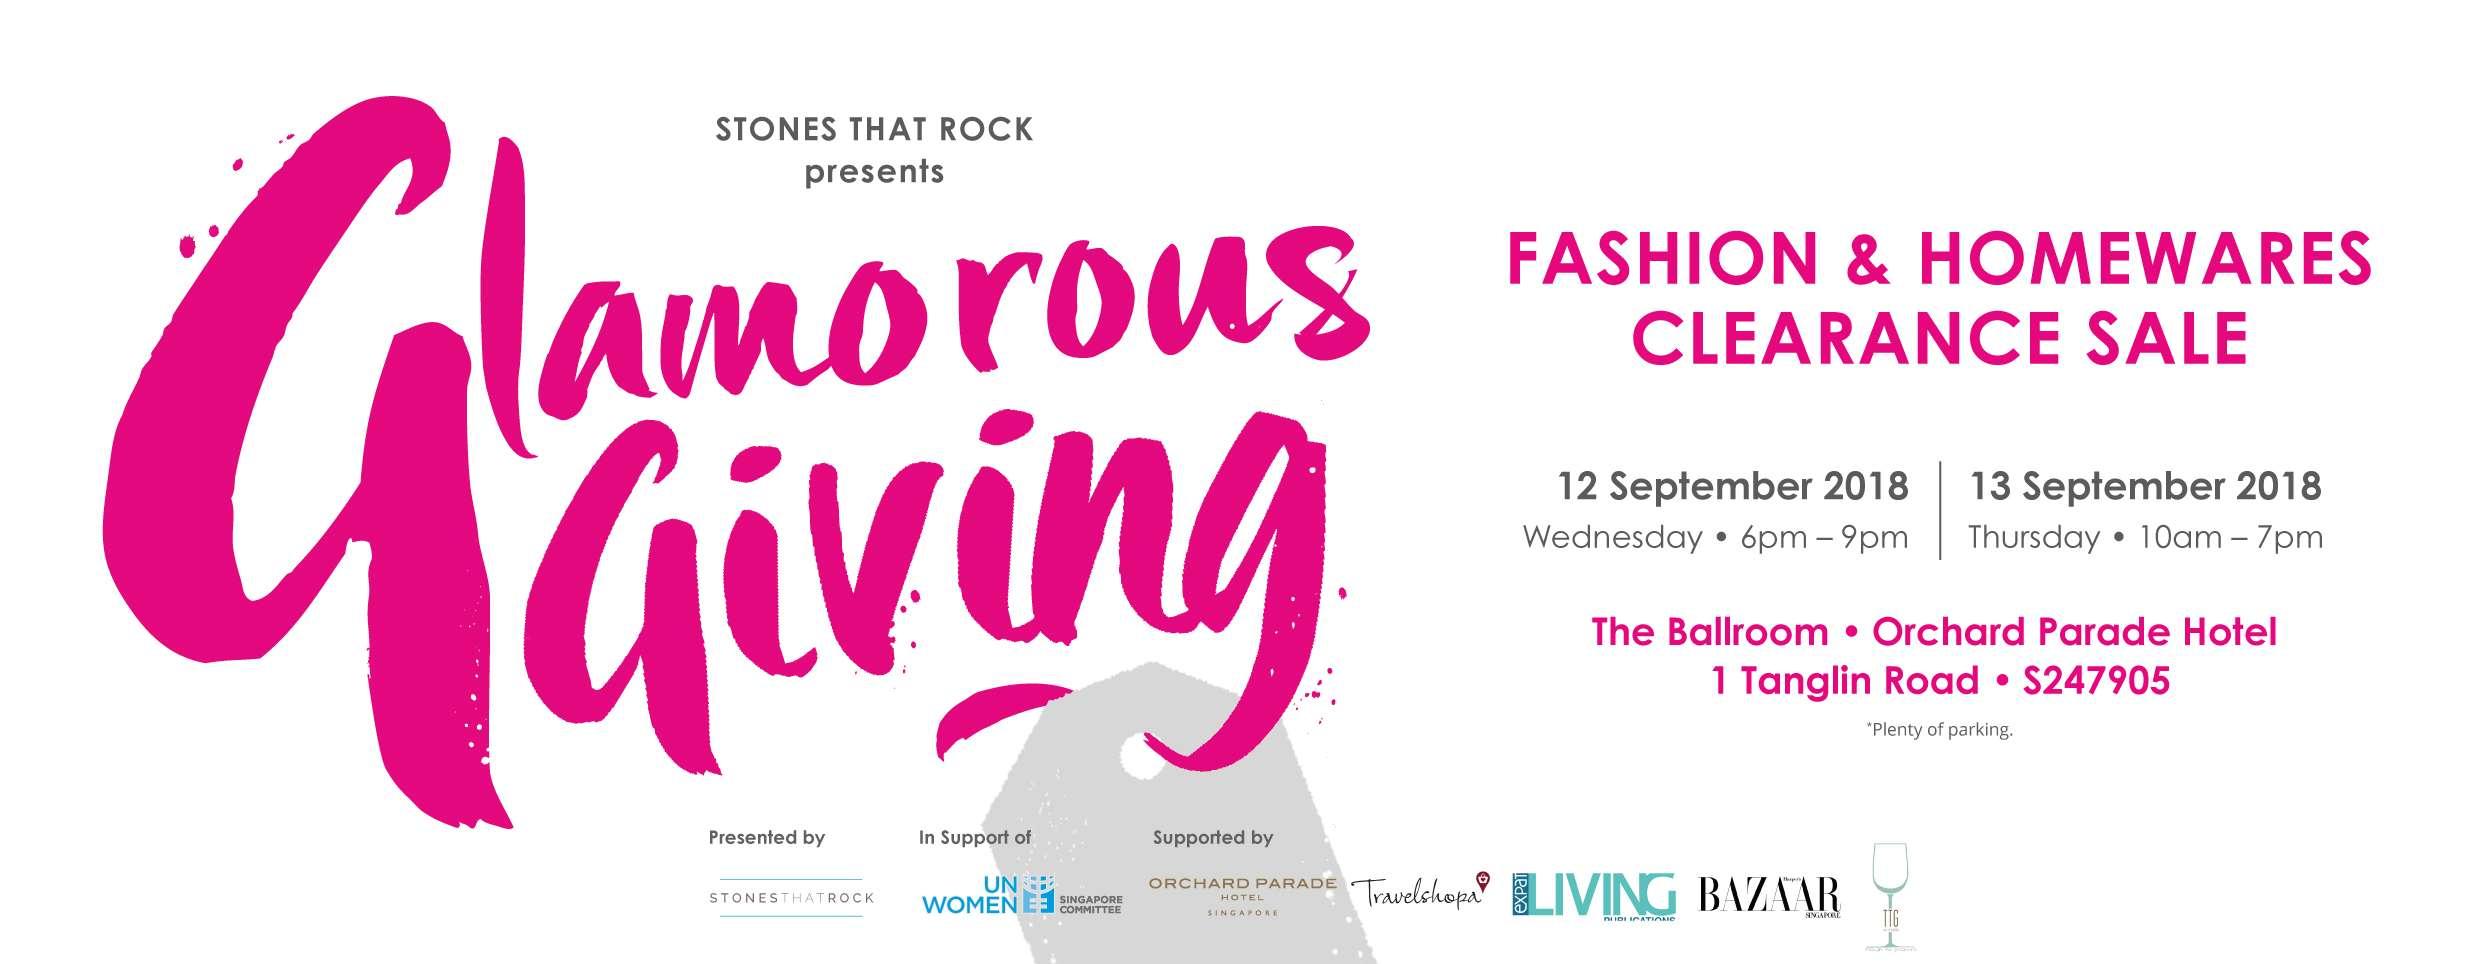 Glamorous Giving cover image | Singapore | Travelshopa